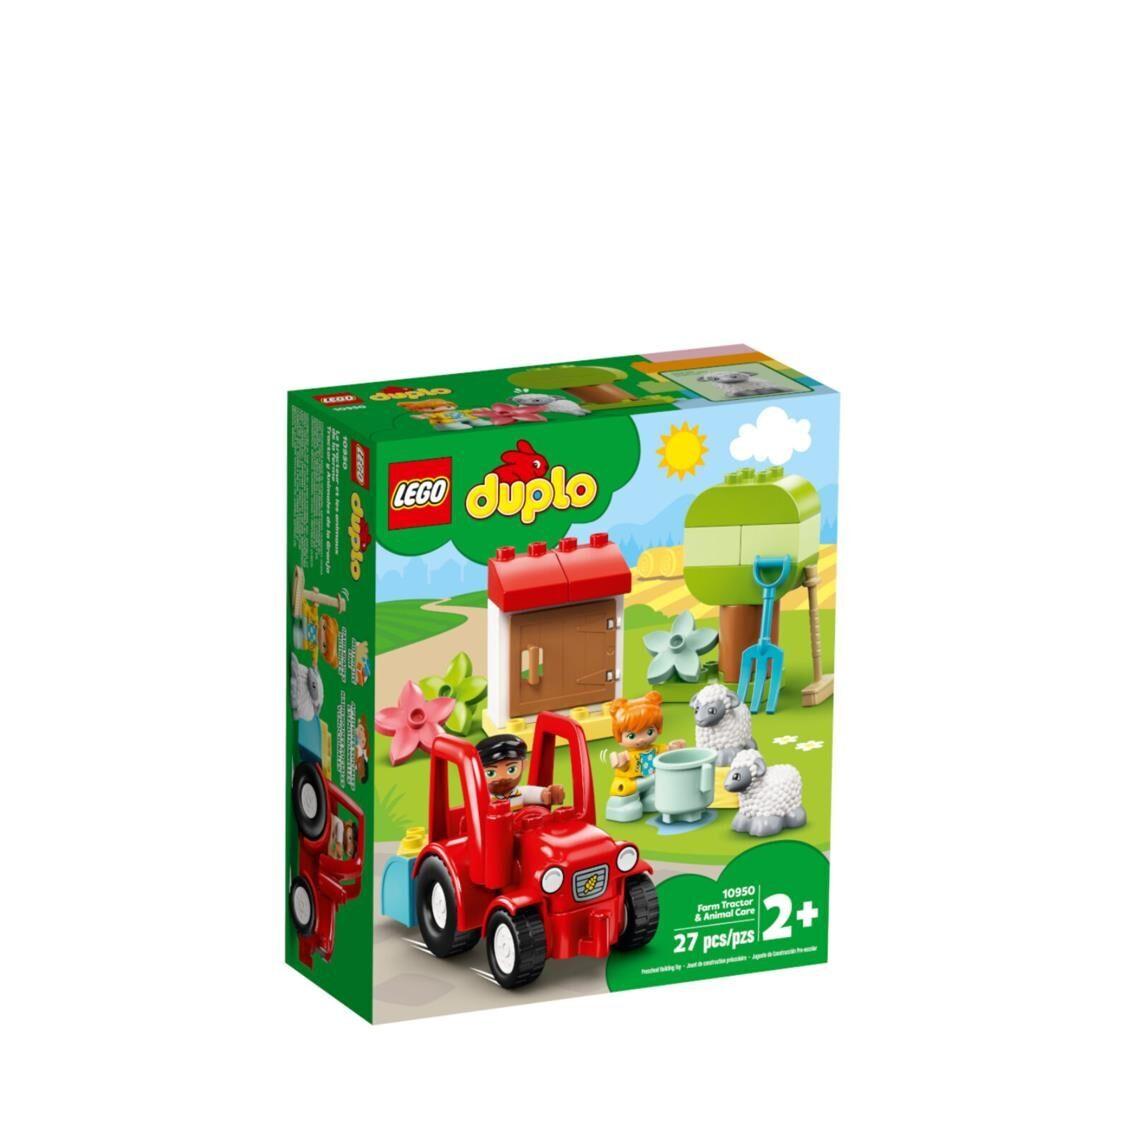 LEGO DUPLO Town - Farm Tractor  Animal Care 10950